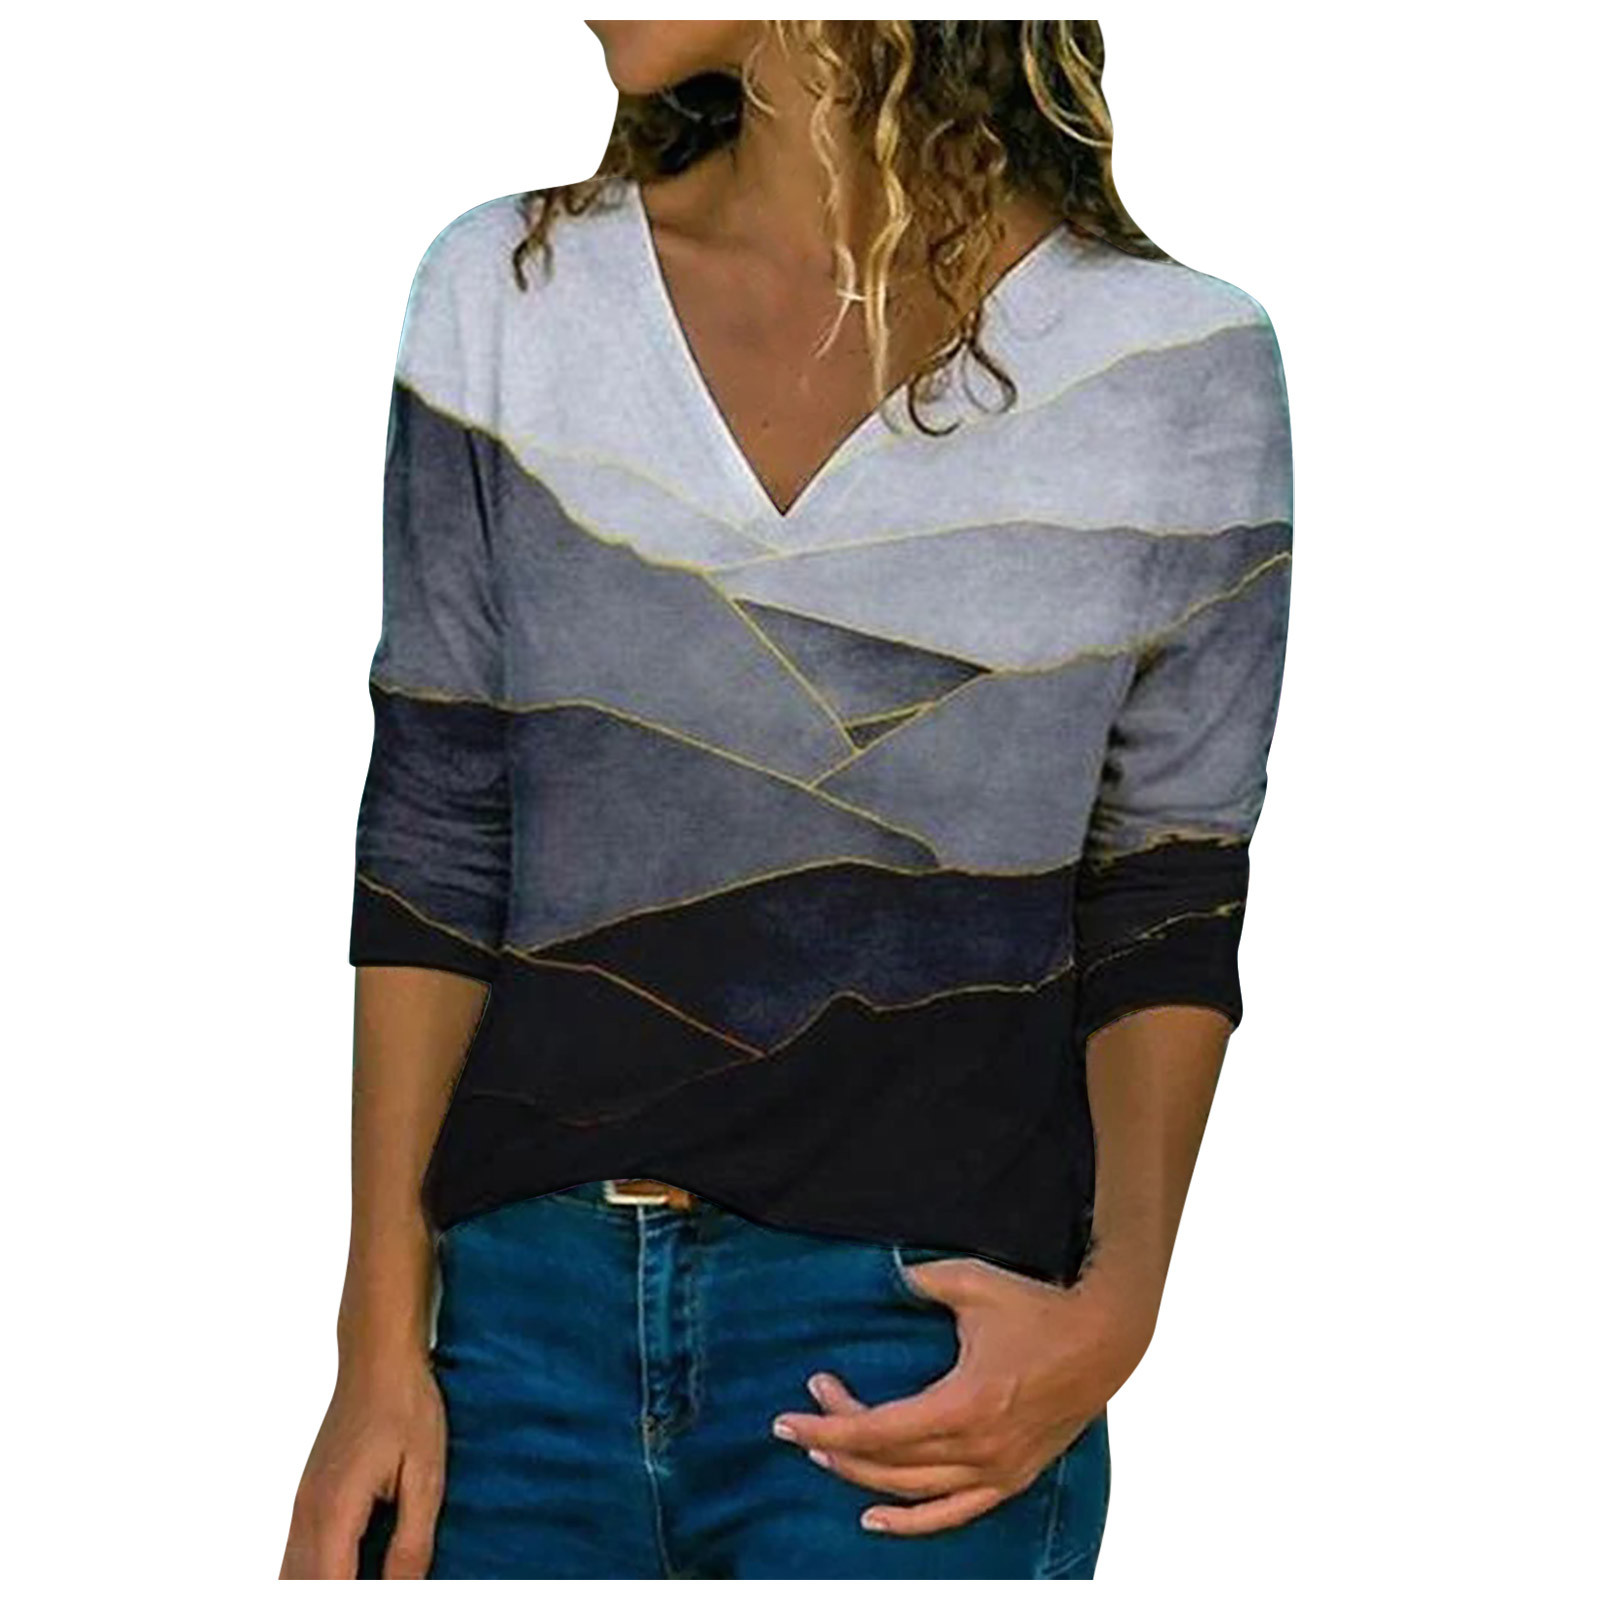 Autumn Women's Blouse Creative V-neck Geometric Printed Shirts Fashion Casual Long Sleeve Loose Female Tops Blouse Blusas